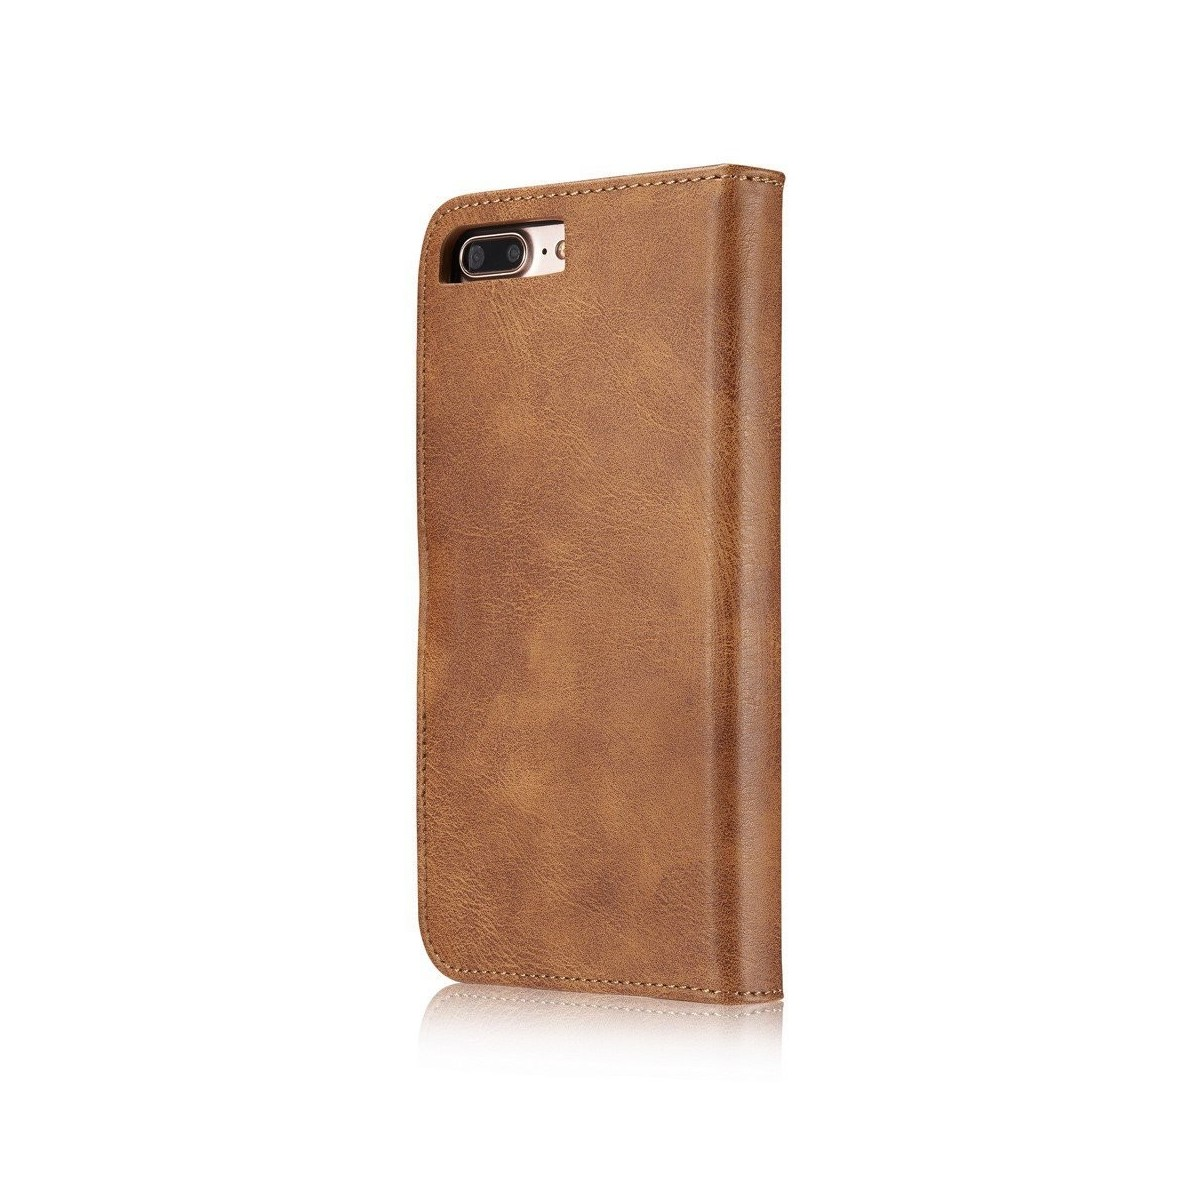 Etui Iphone 7 Plus Portefeuille  Marron - DG MING